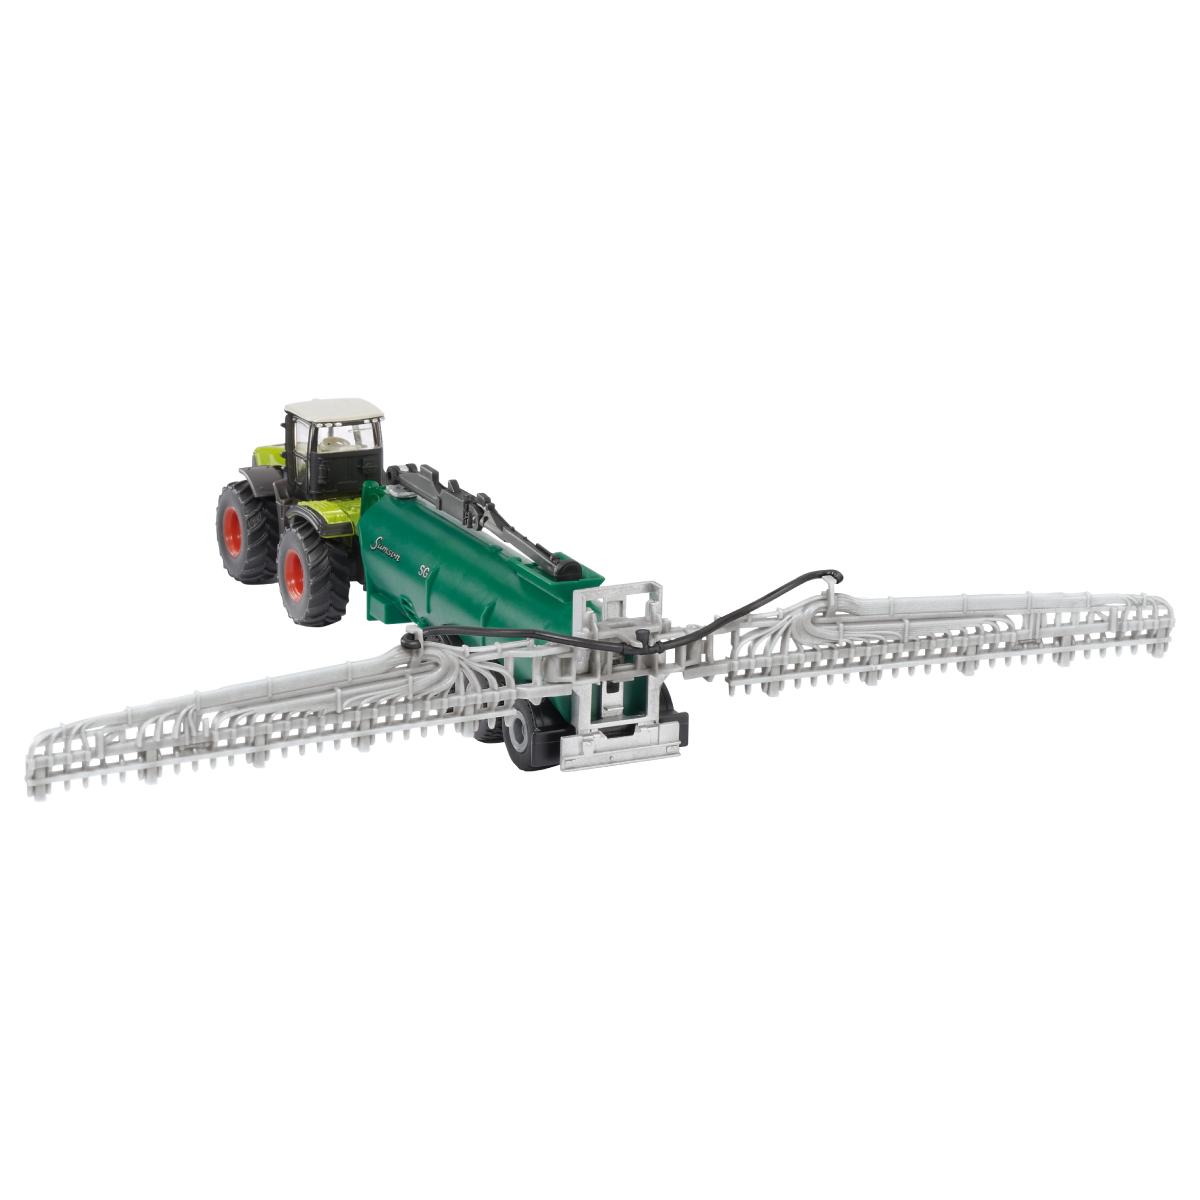 Claas ゼリオン トラクター バキュームタンカー付き 1:87(ジク・SIKU)